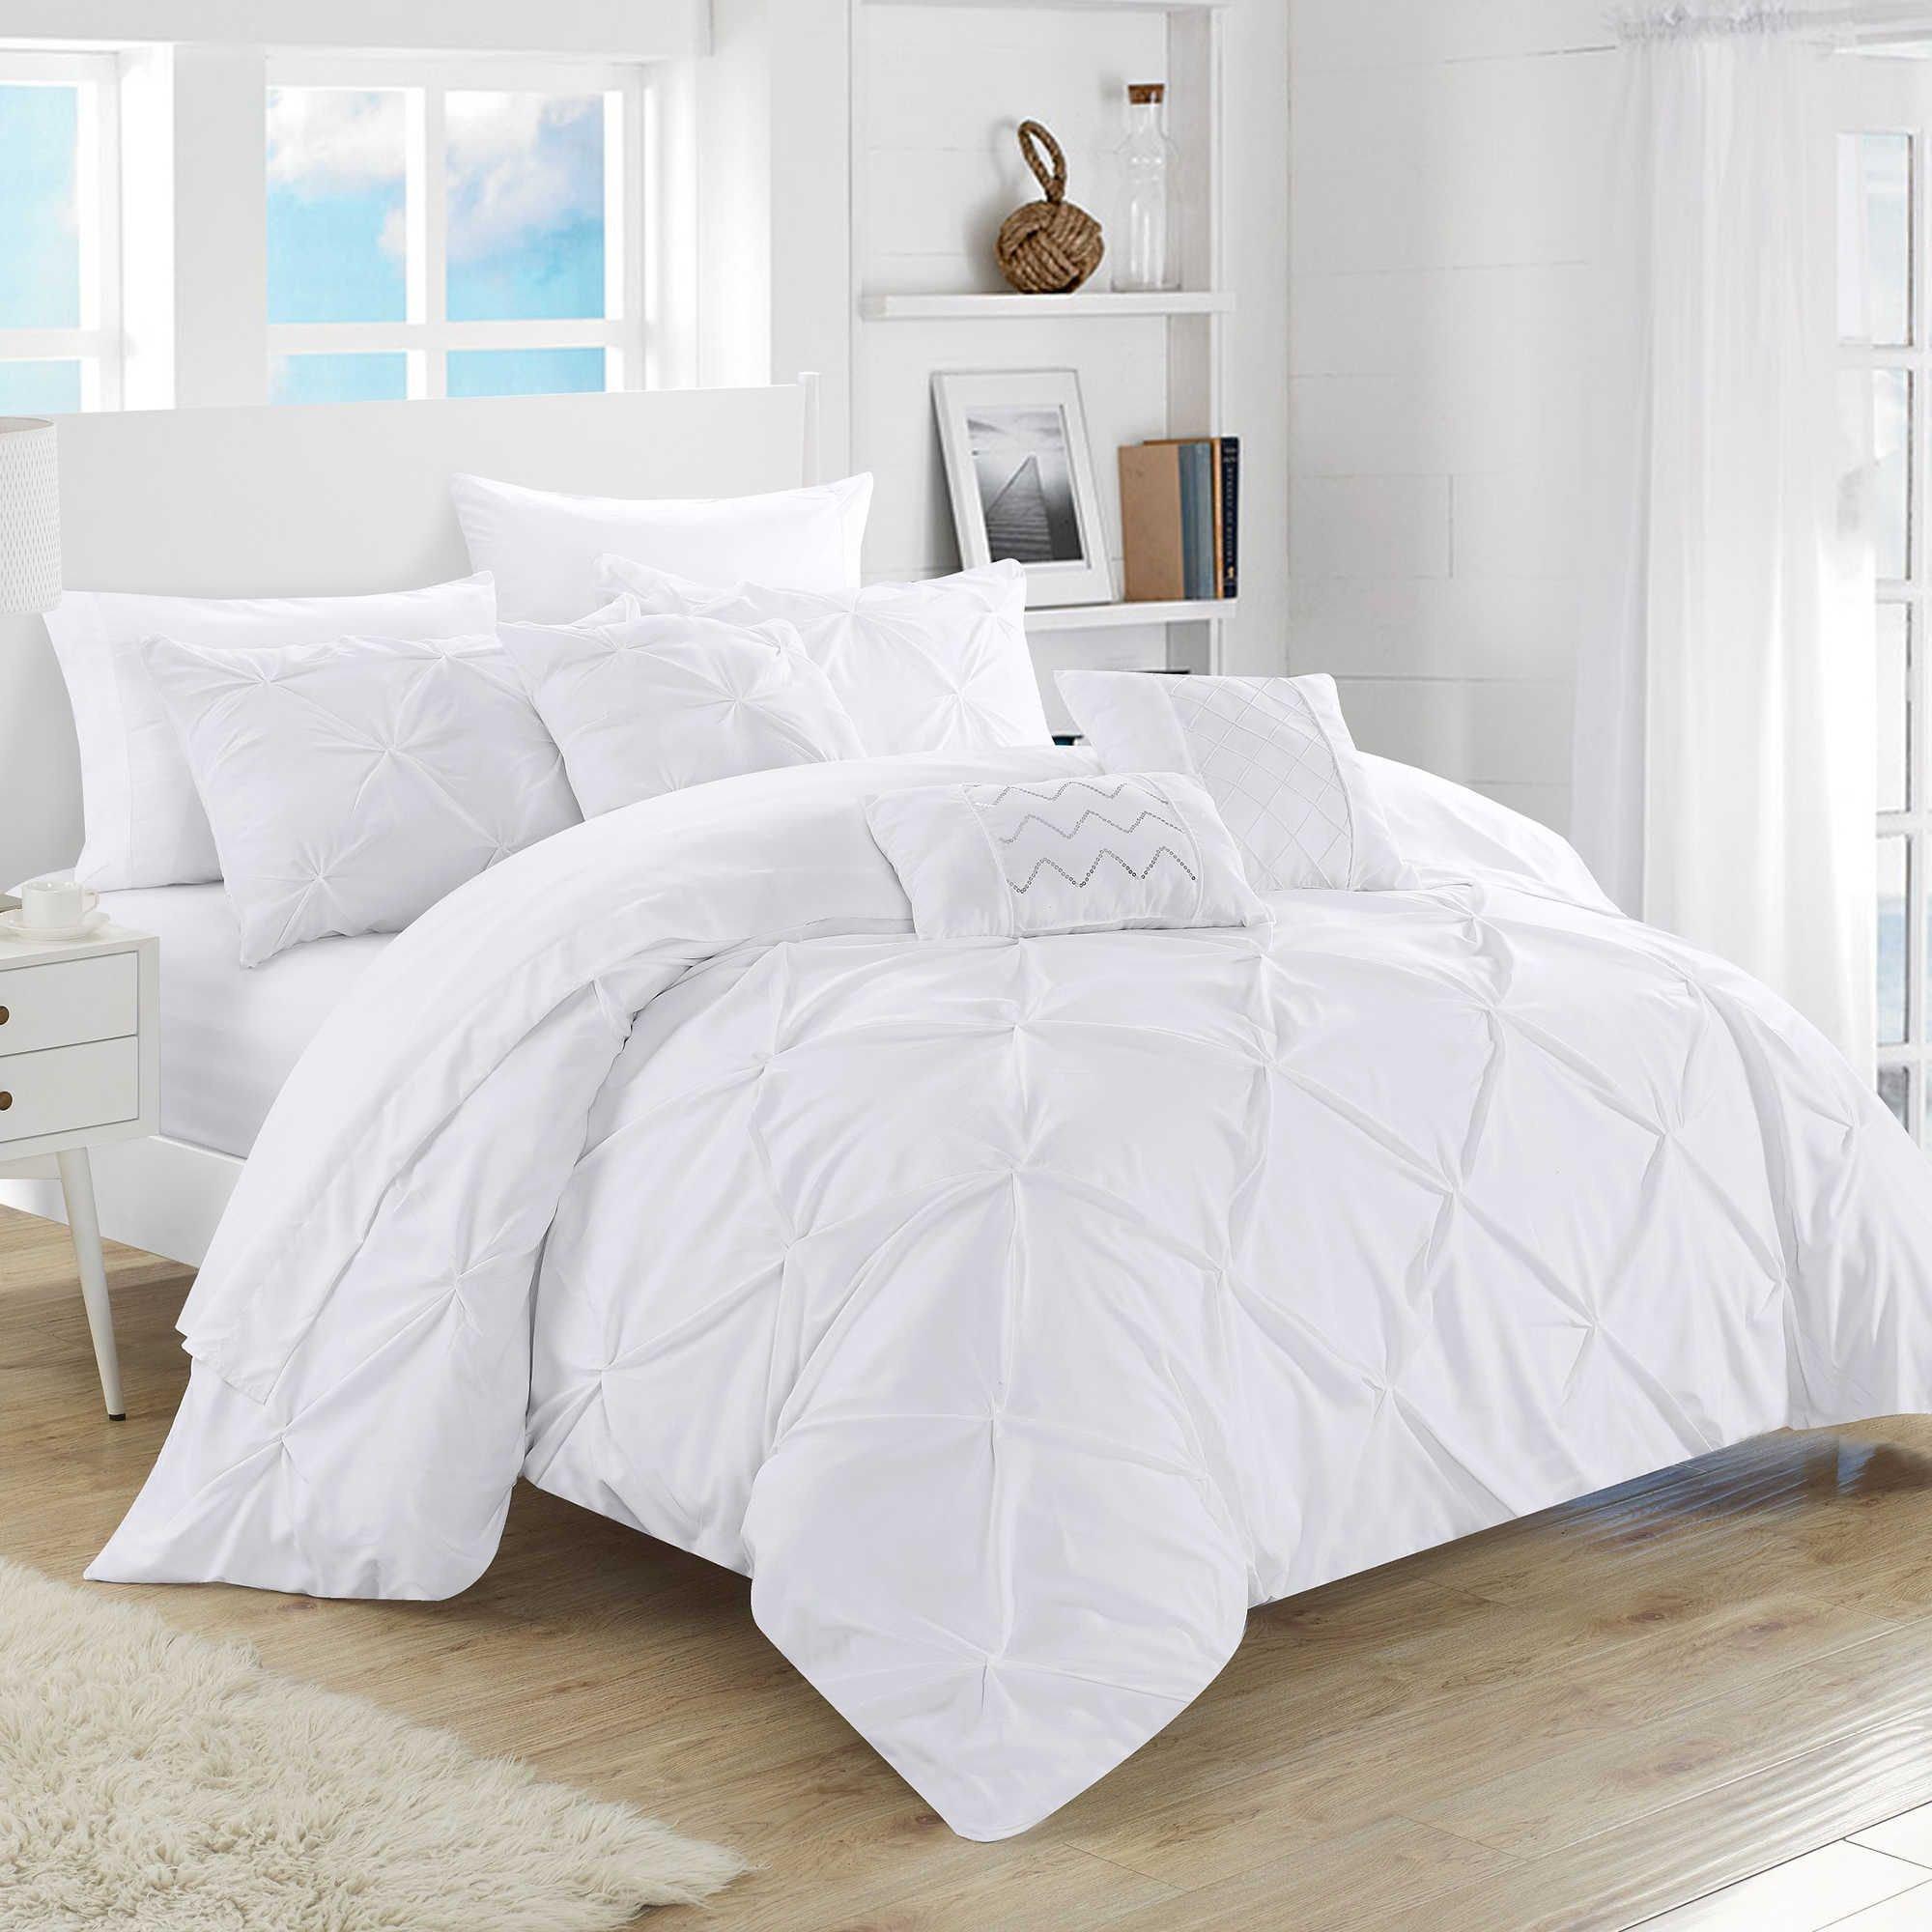 Cheap Bedroom Comforter Set Unique Chic Home Salvatore 10 Piece forter Set